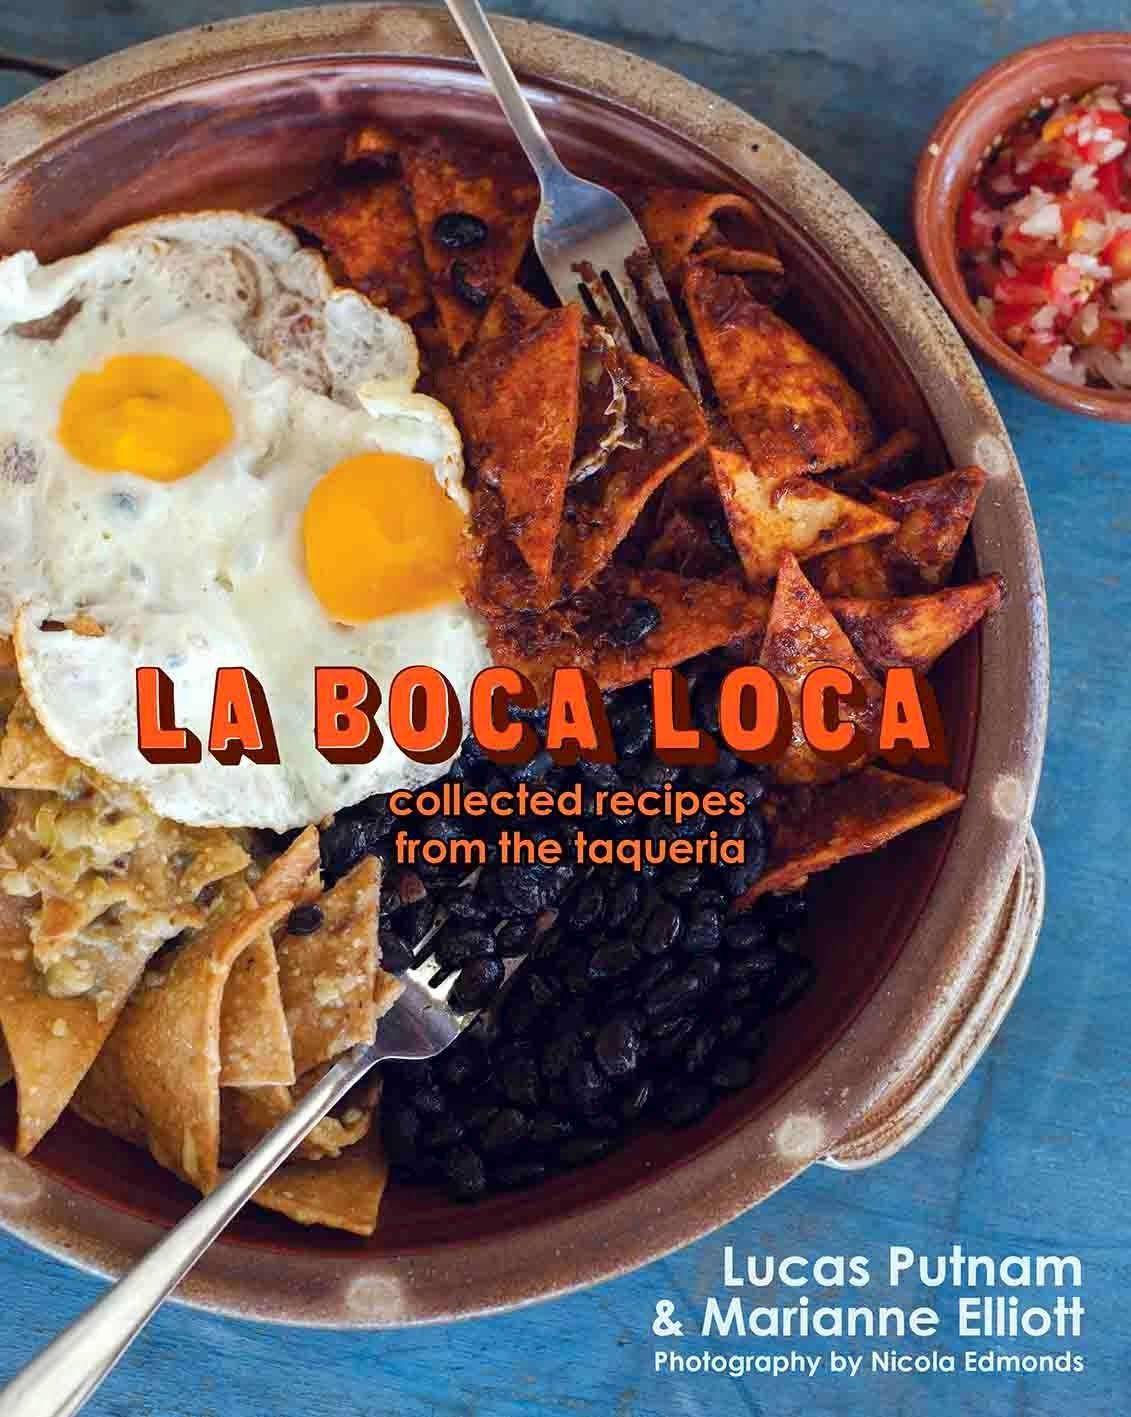 Shoot And Eat La Boca Loca Collected Recipes From The Taqueria Recipes Wine Recipes Eat